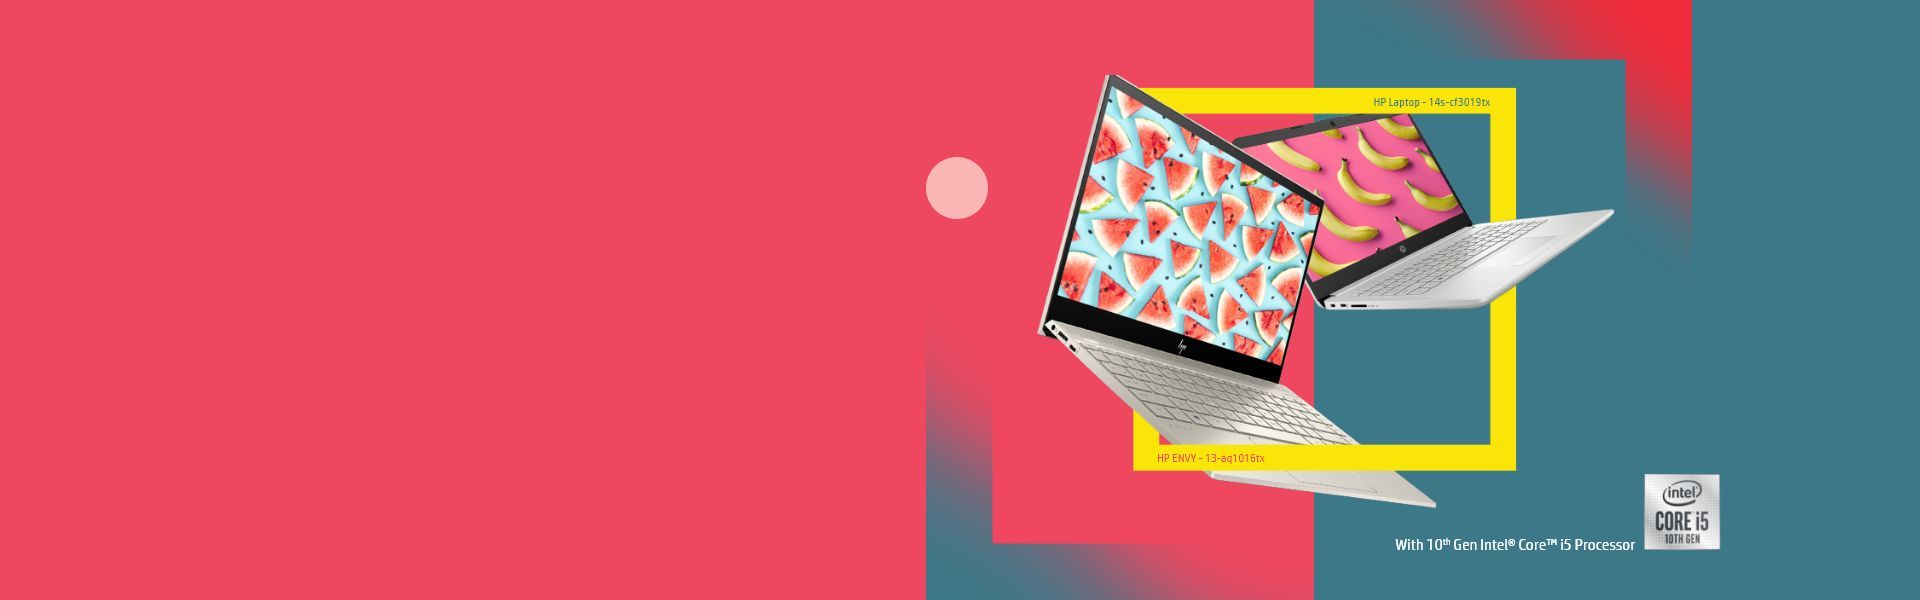 HP Laptop Sales